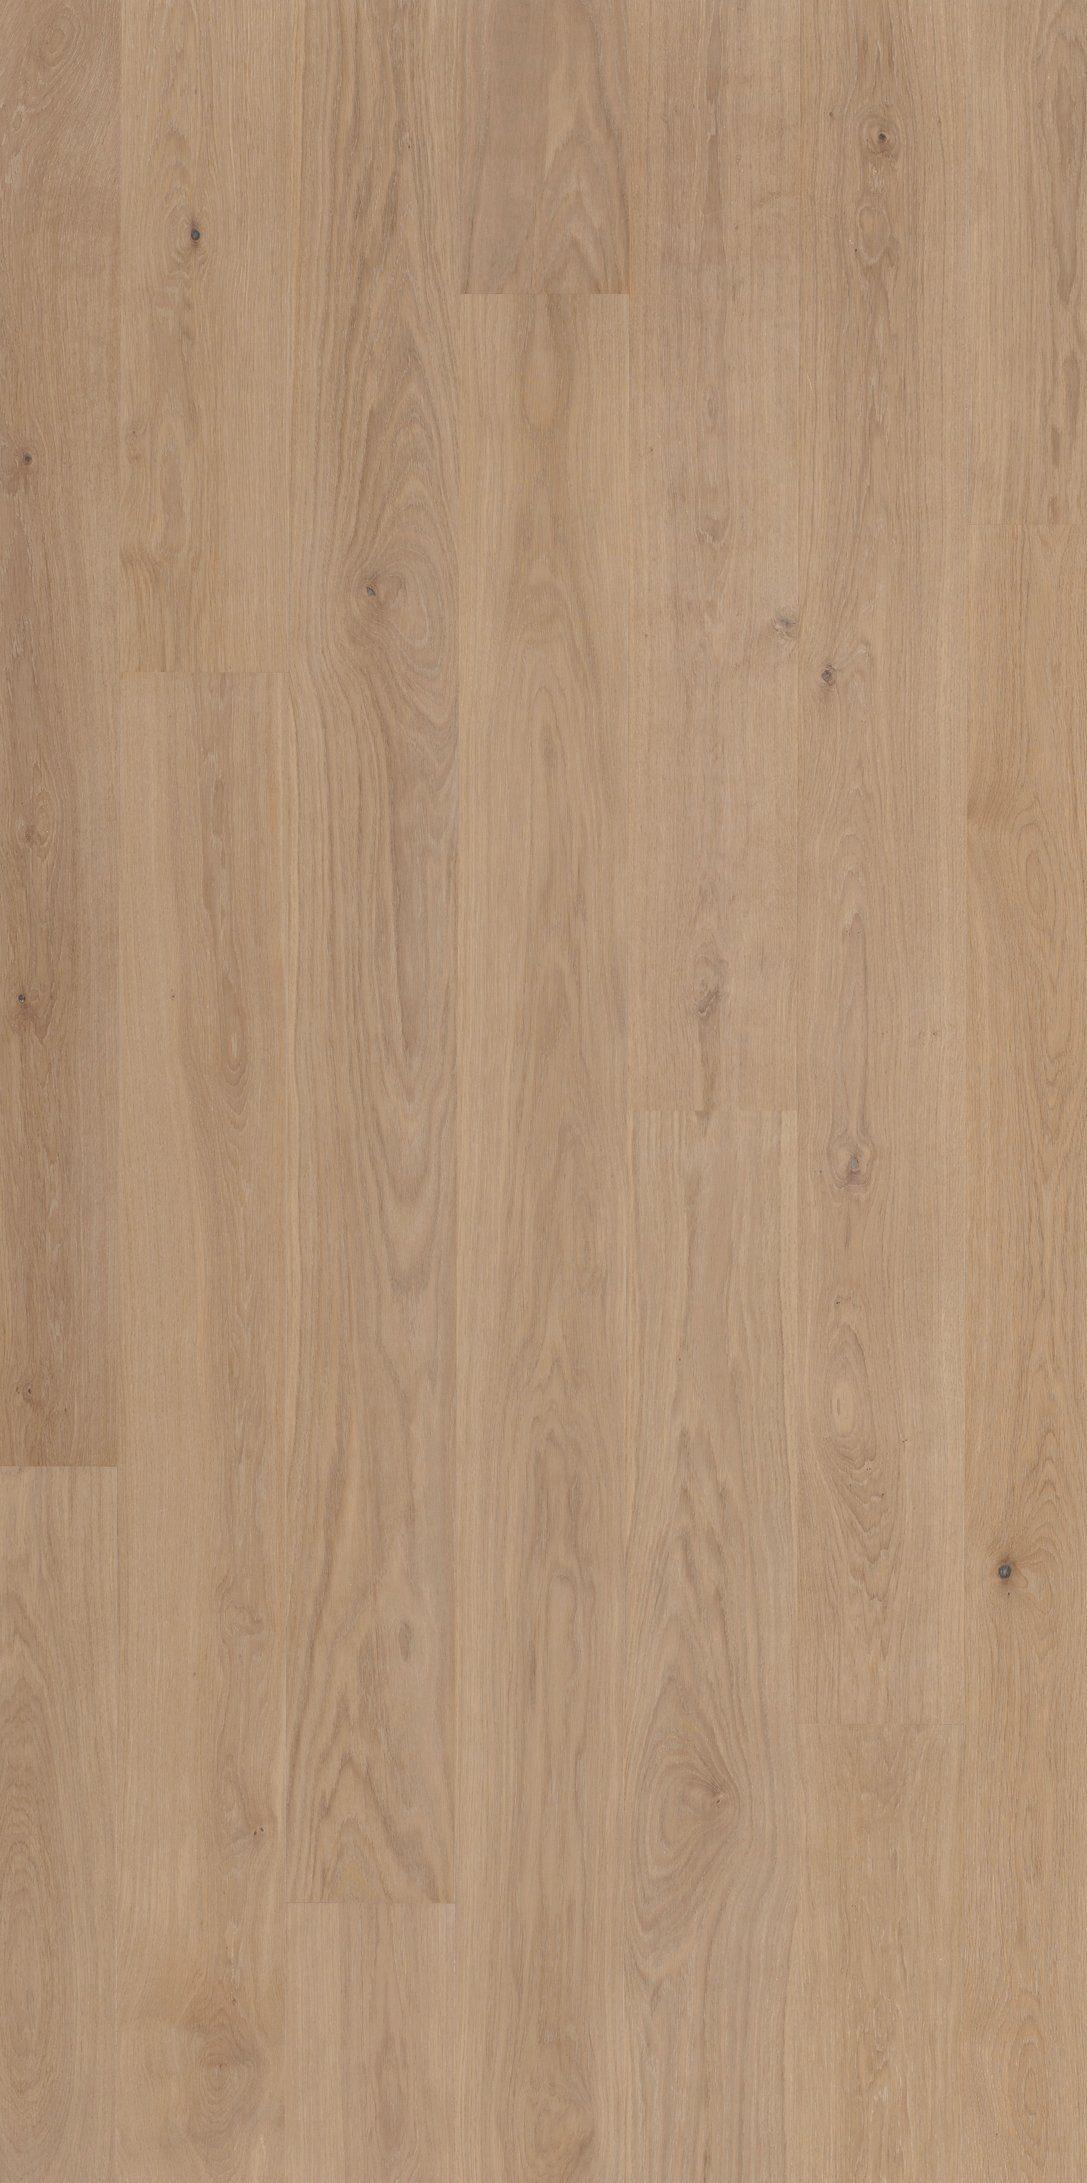 PARADOR Parkett »Classic 3060 Natur - Eiche weiß, lackiert«, 2200 x 185 mm, Stärke: 13 mm, 3,66 m²